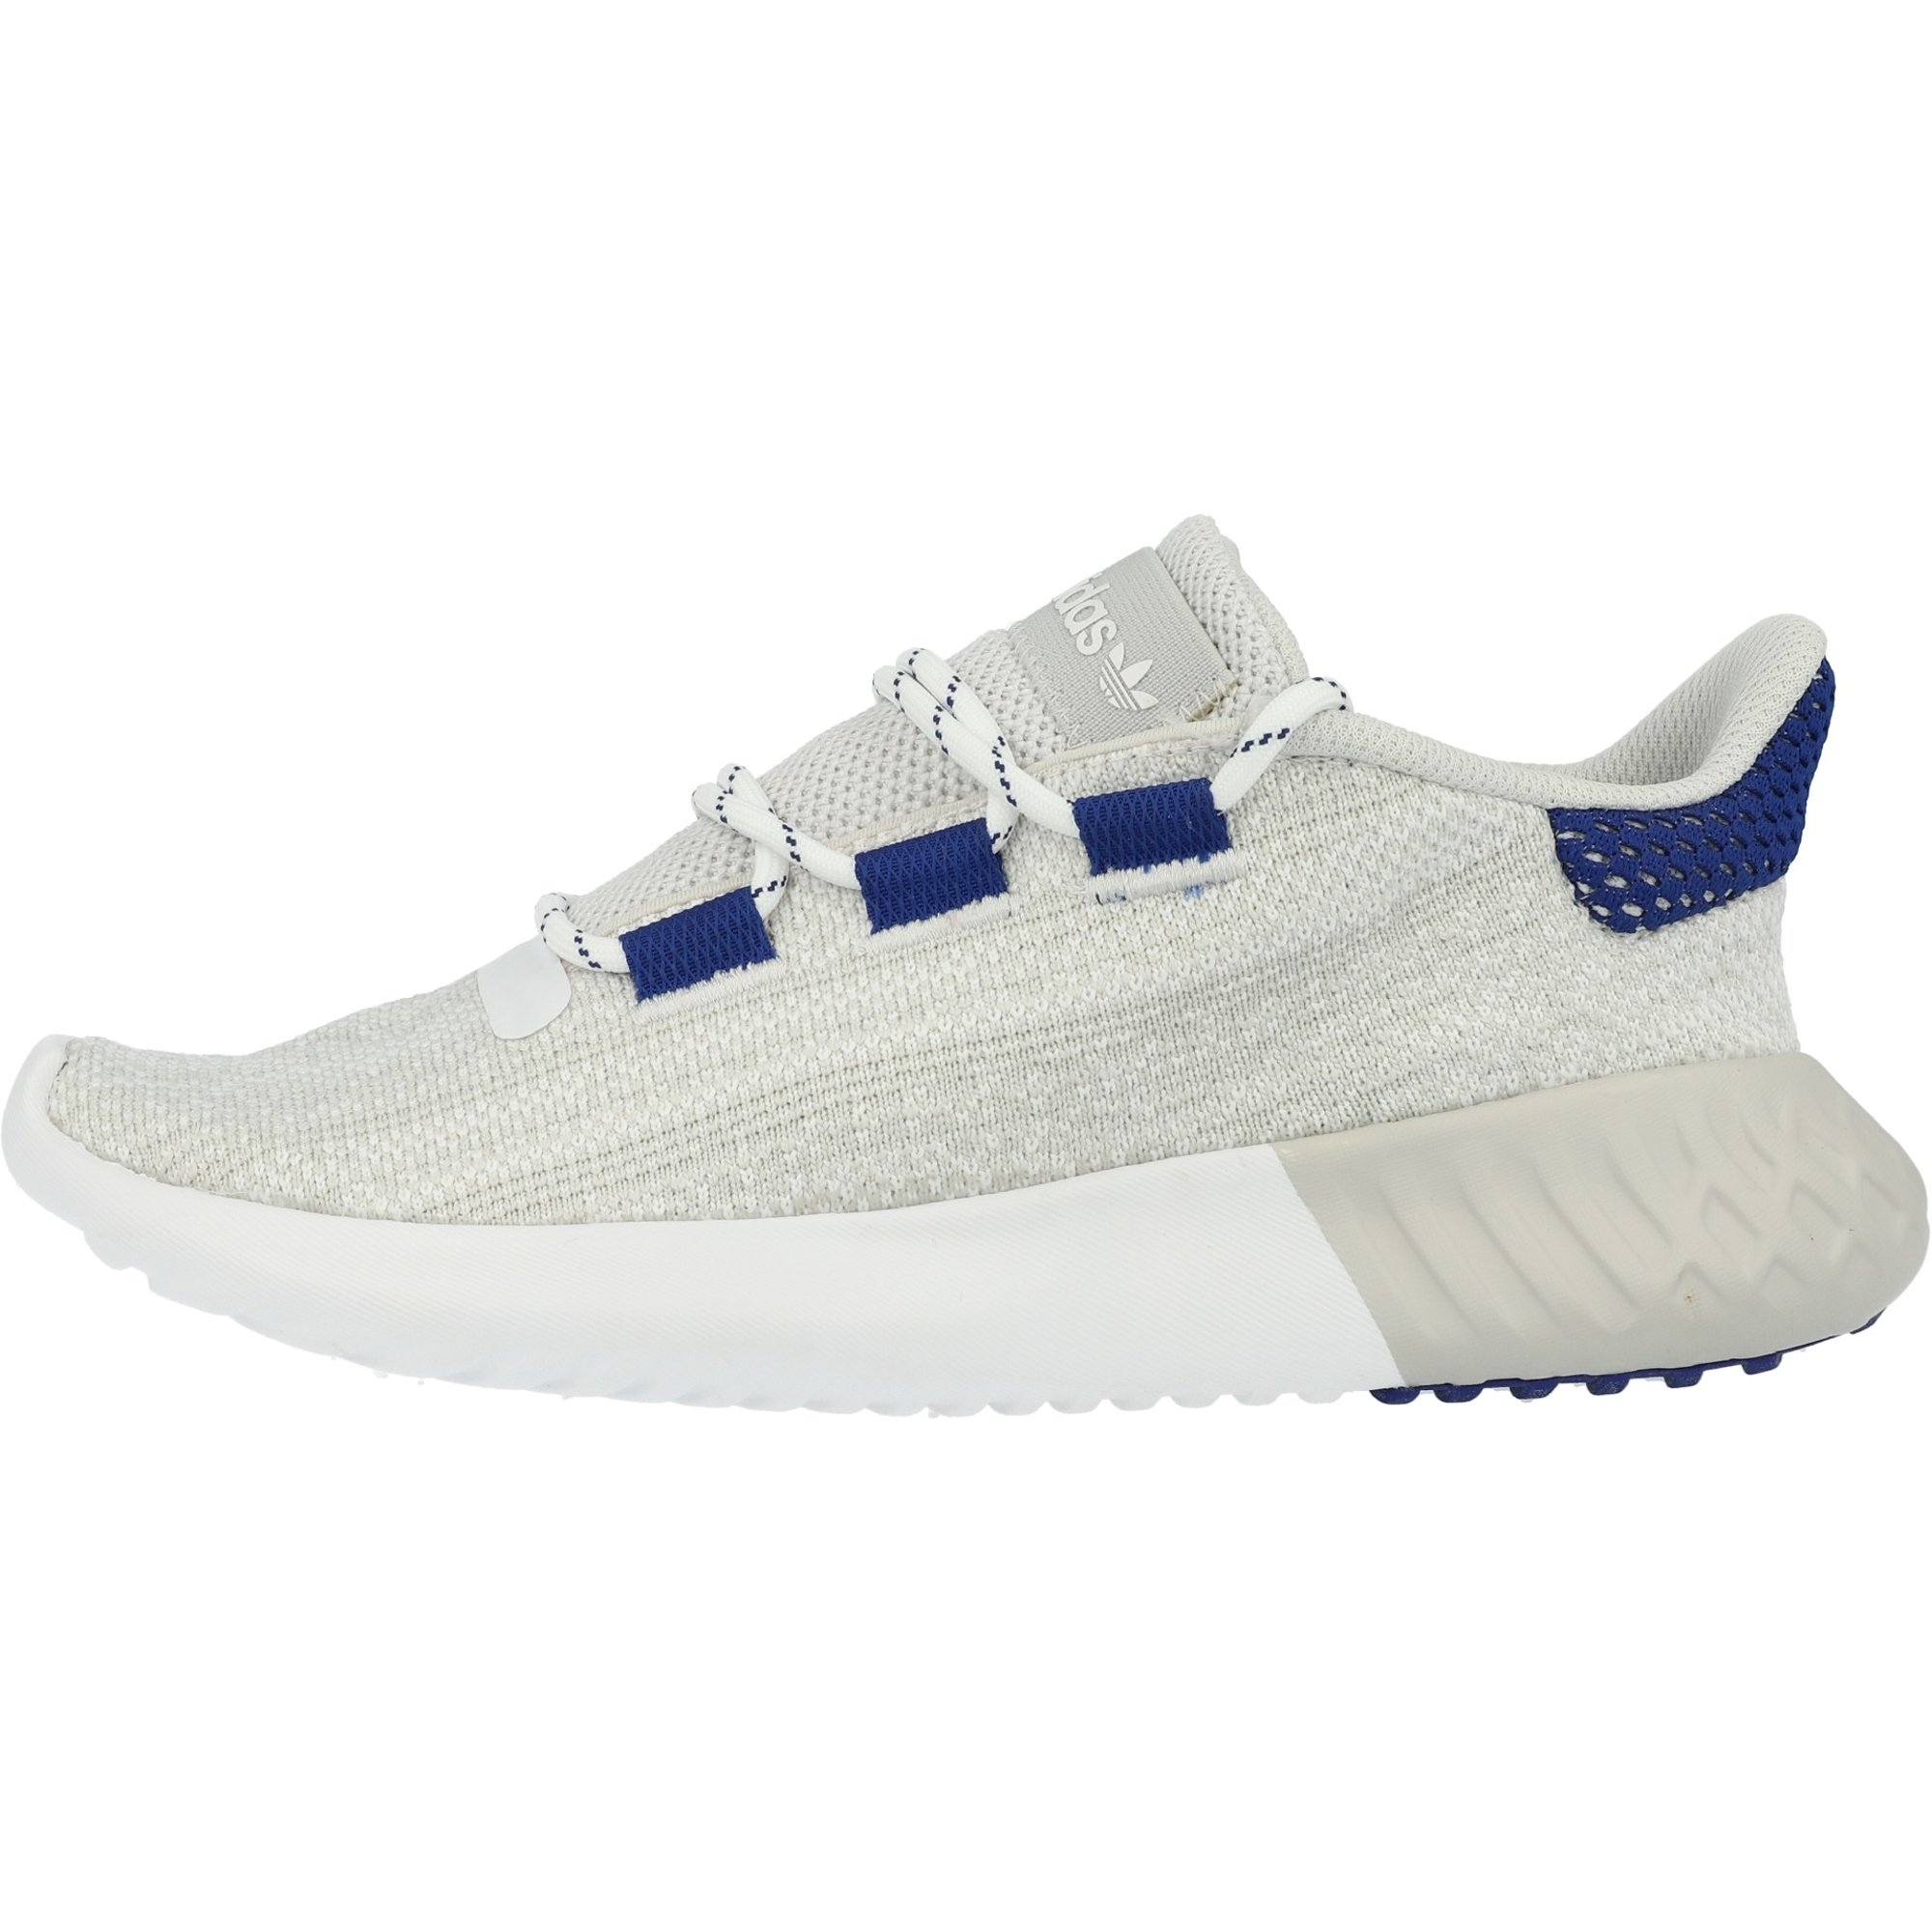 adidas Tubular Dusk Junior Sneakers Casual Grey Boys